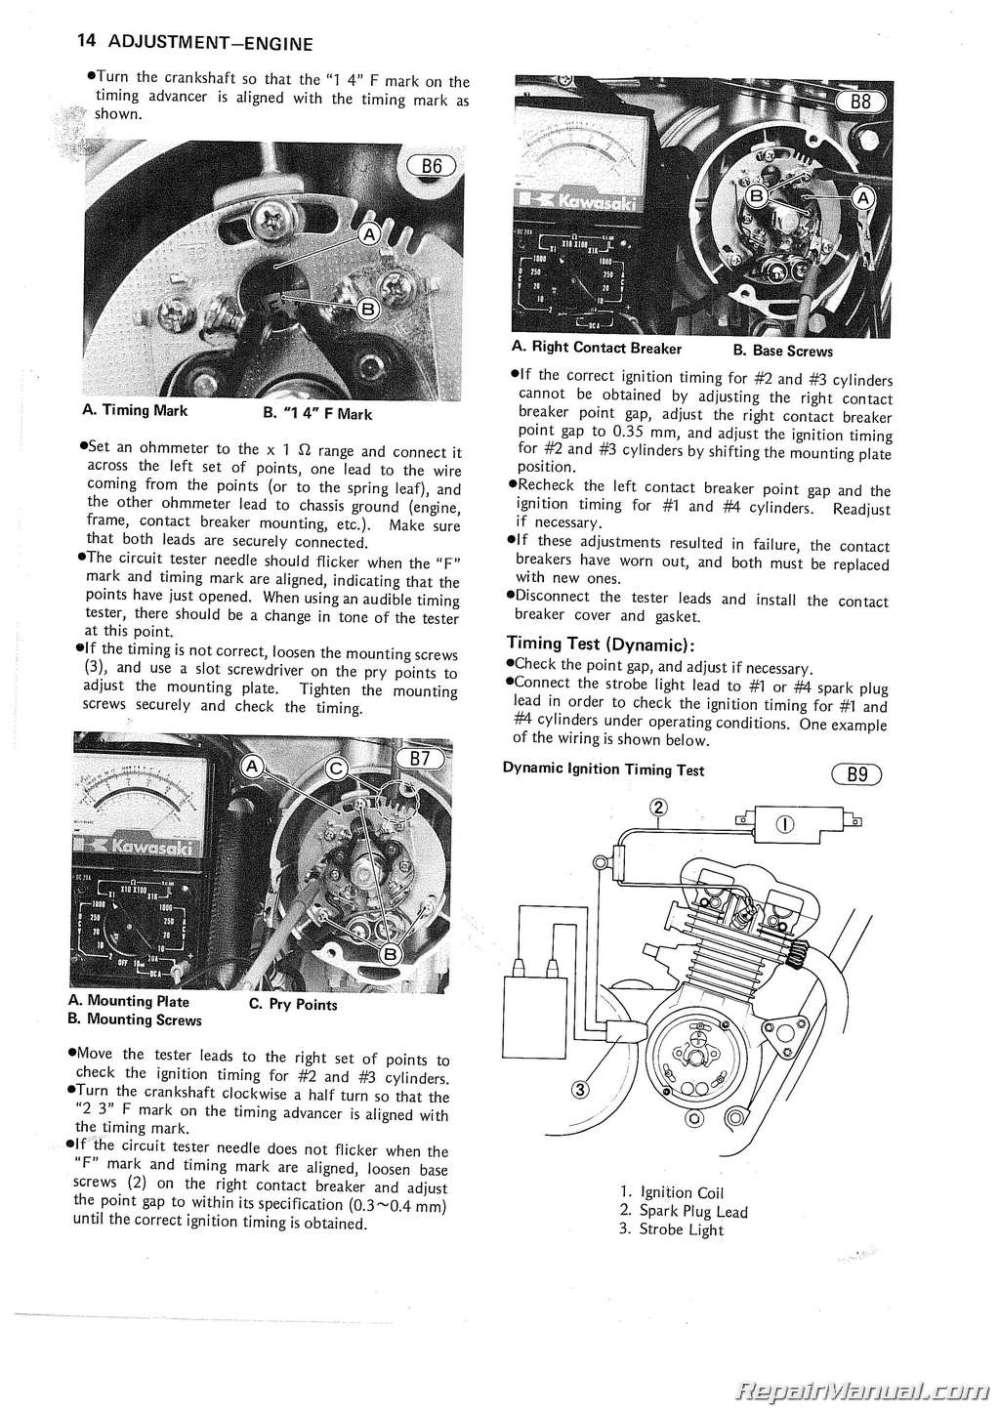 medium resolution of wrg 2570 kz400 wiring diagramkz400 wiring diagram